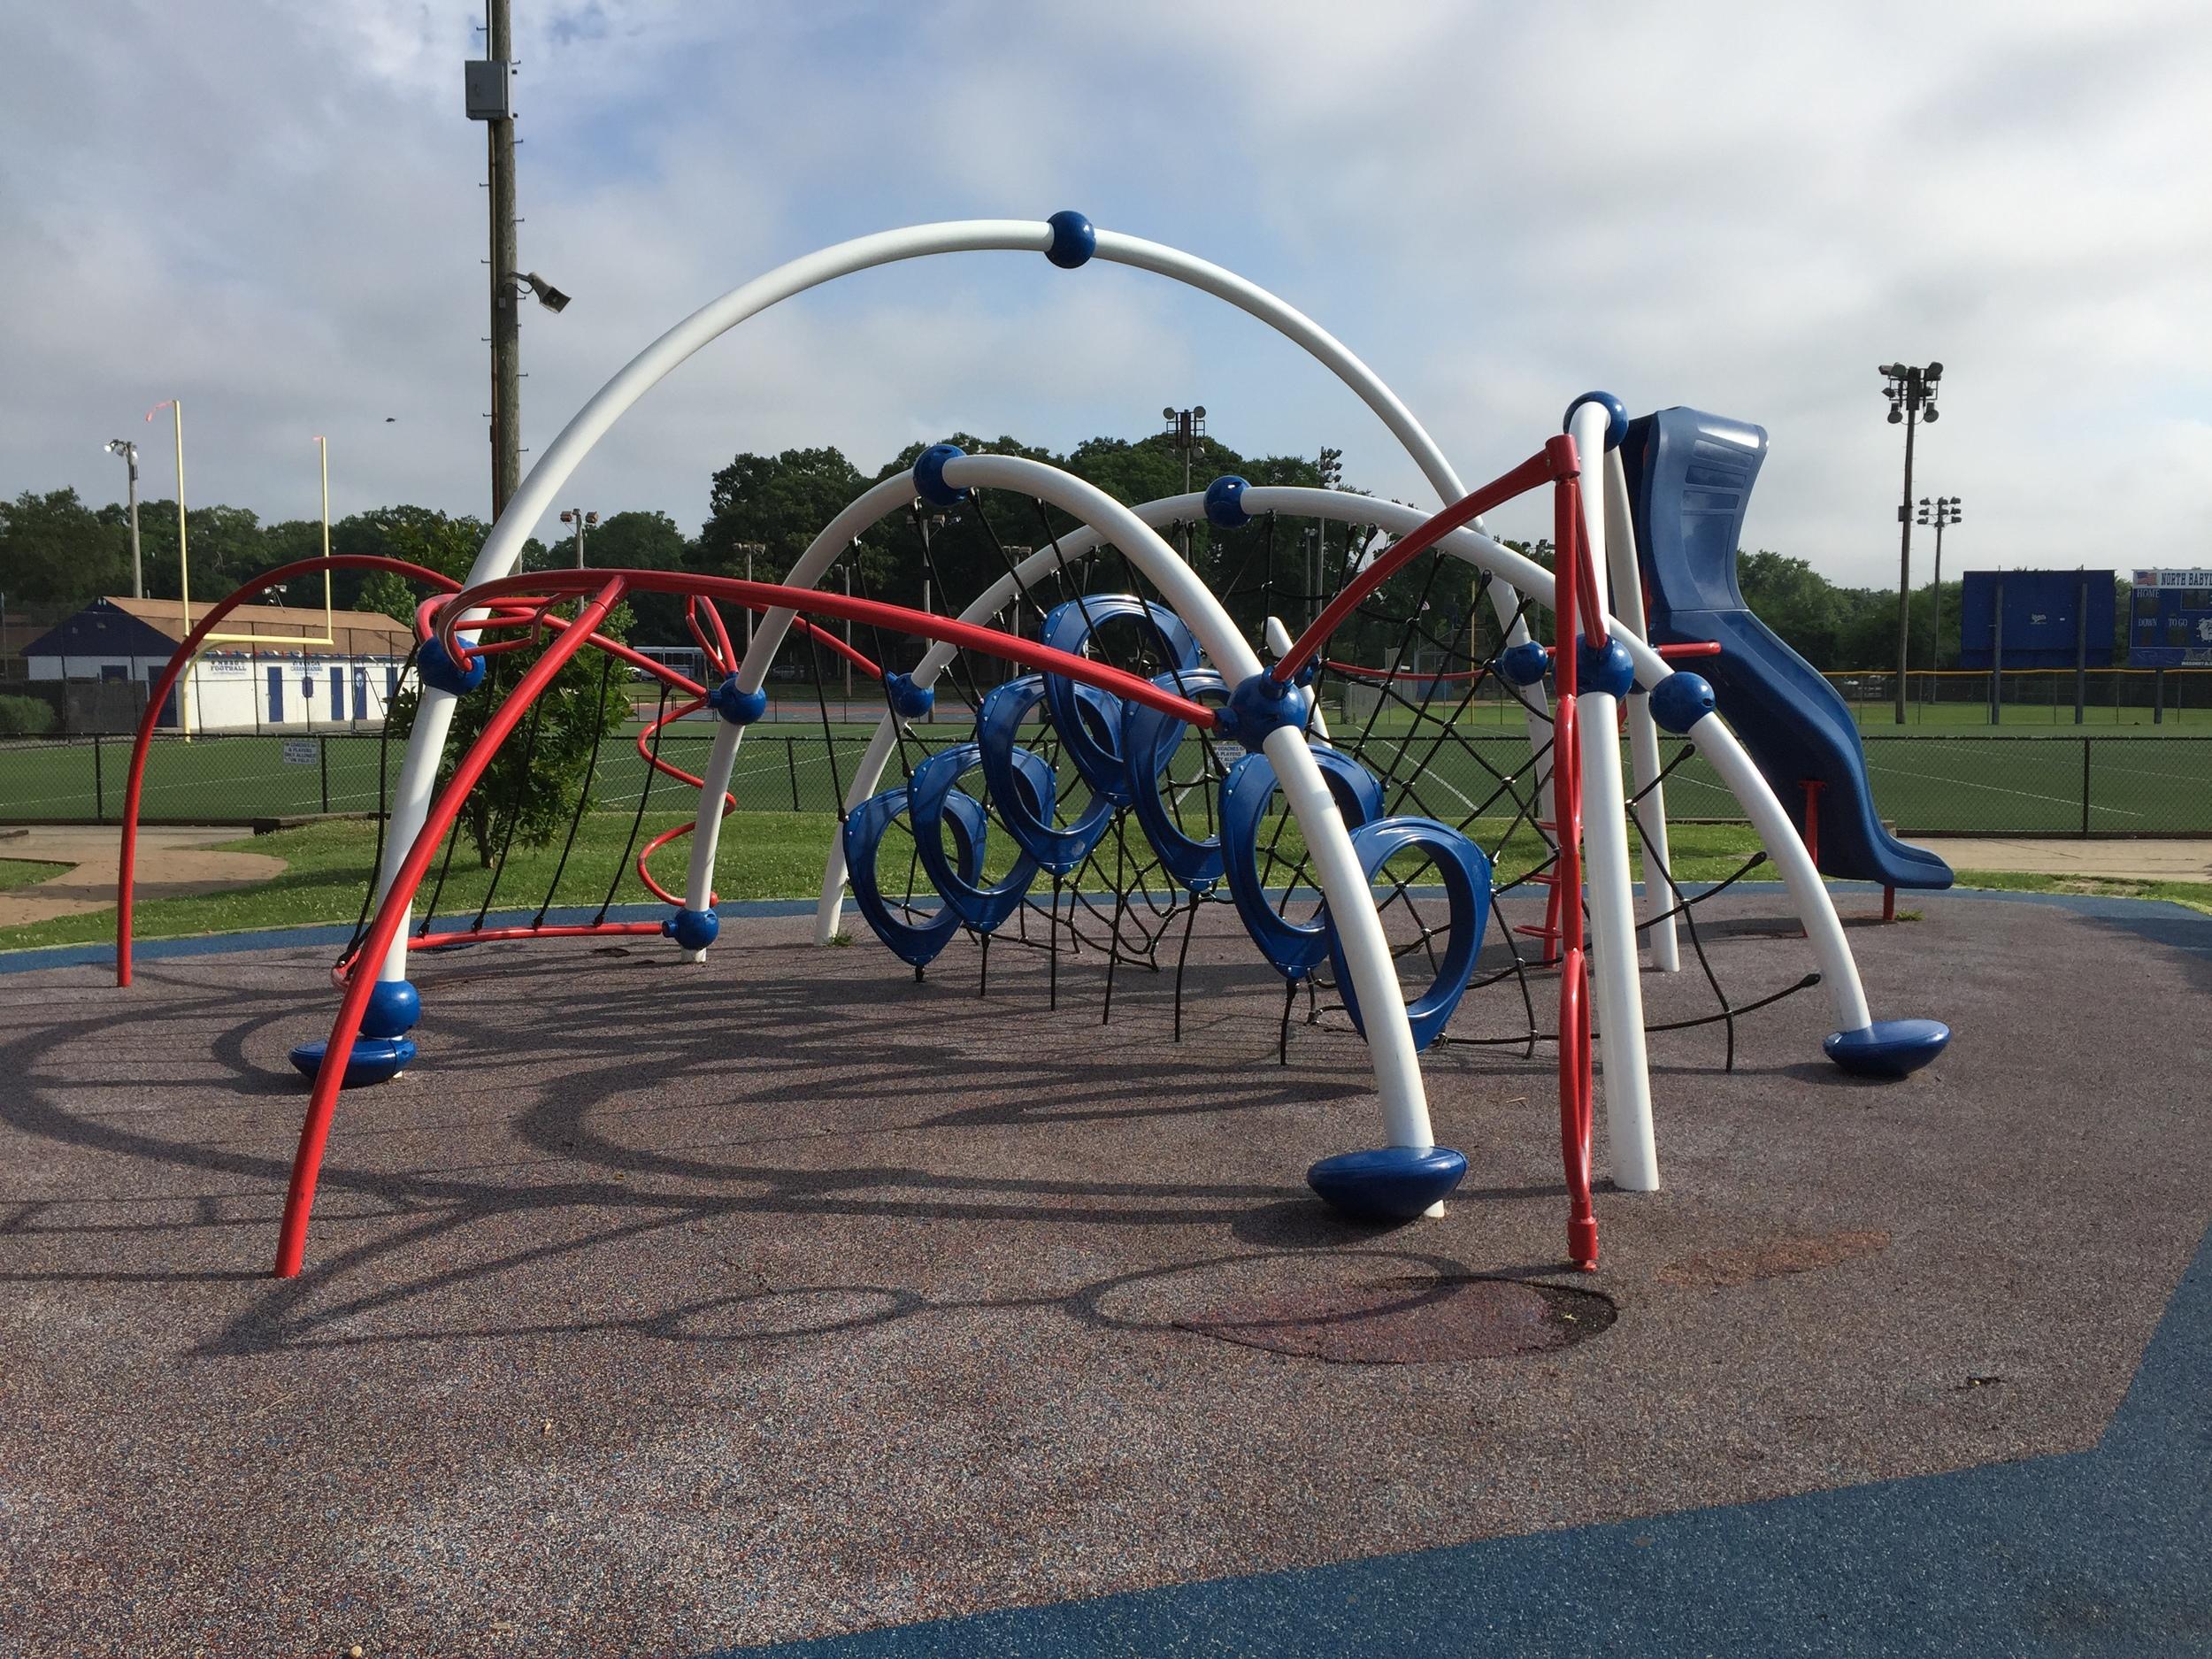 Rope climb playground at Phelps Lane Park